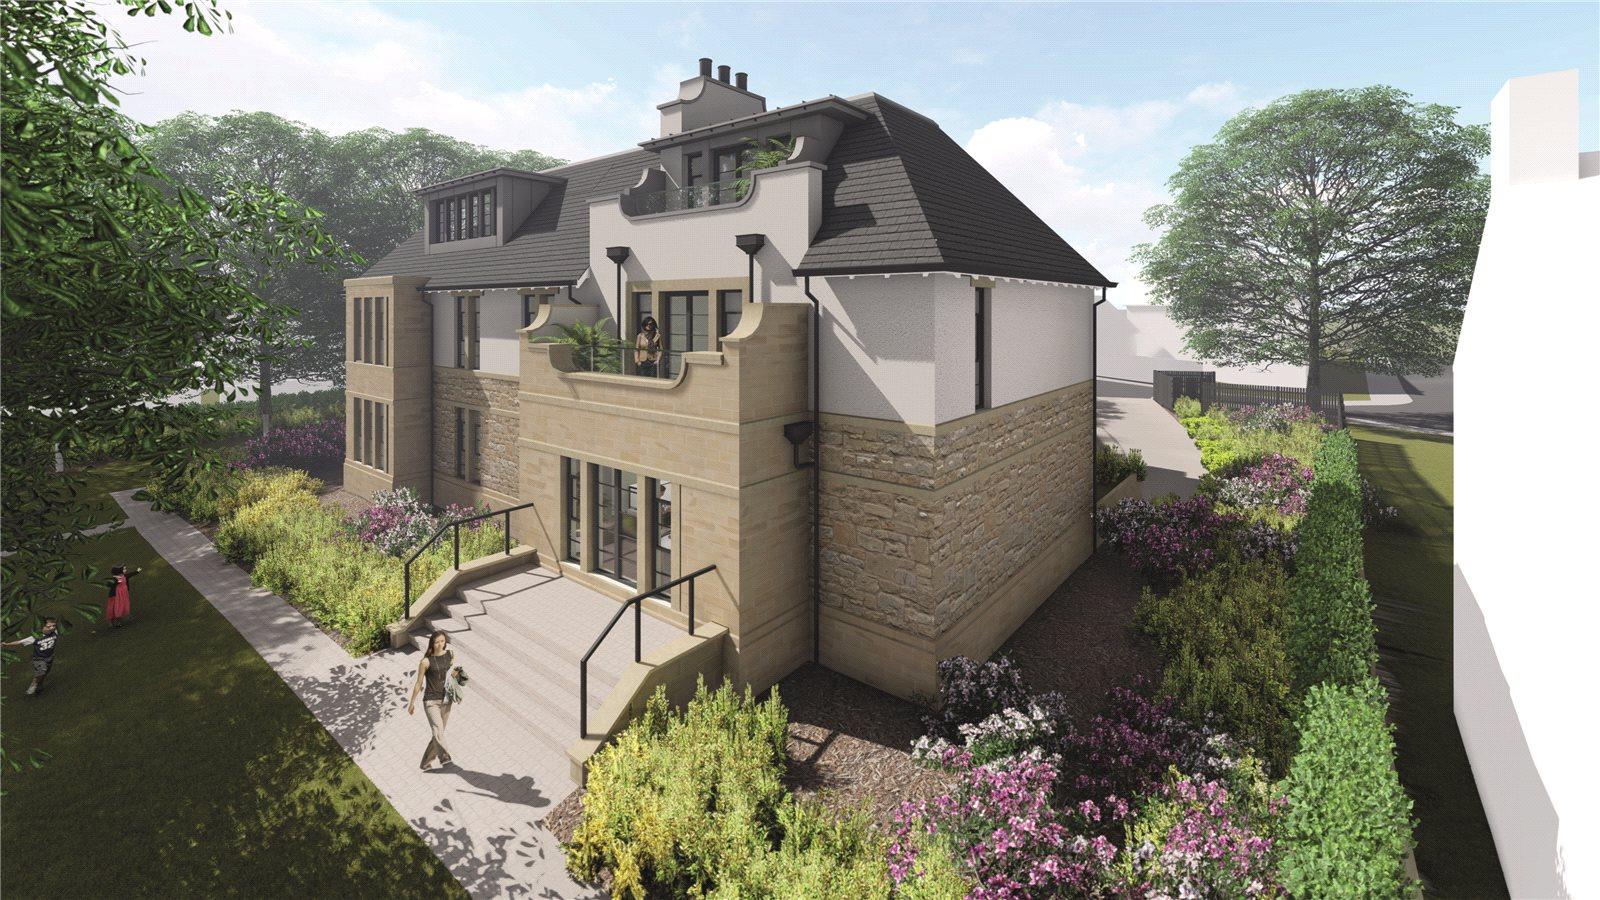 Apartments / Residences for Sale at Greystoke Apartments, Kings Avenue, Morpeth, Northumberland, NE61 Morpeth, England